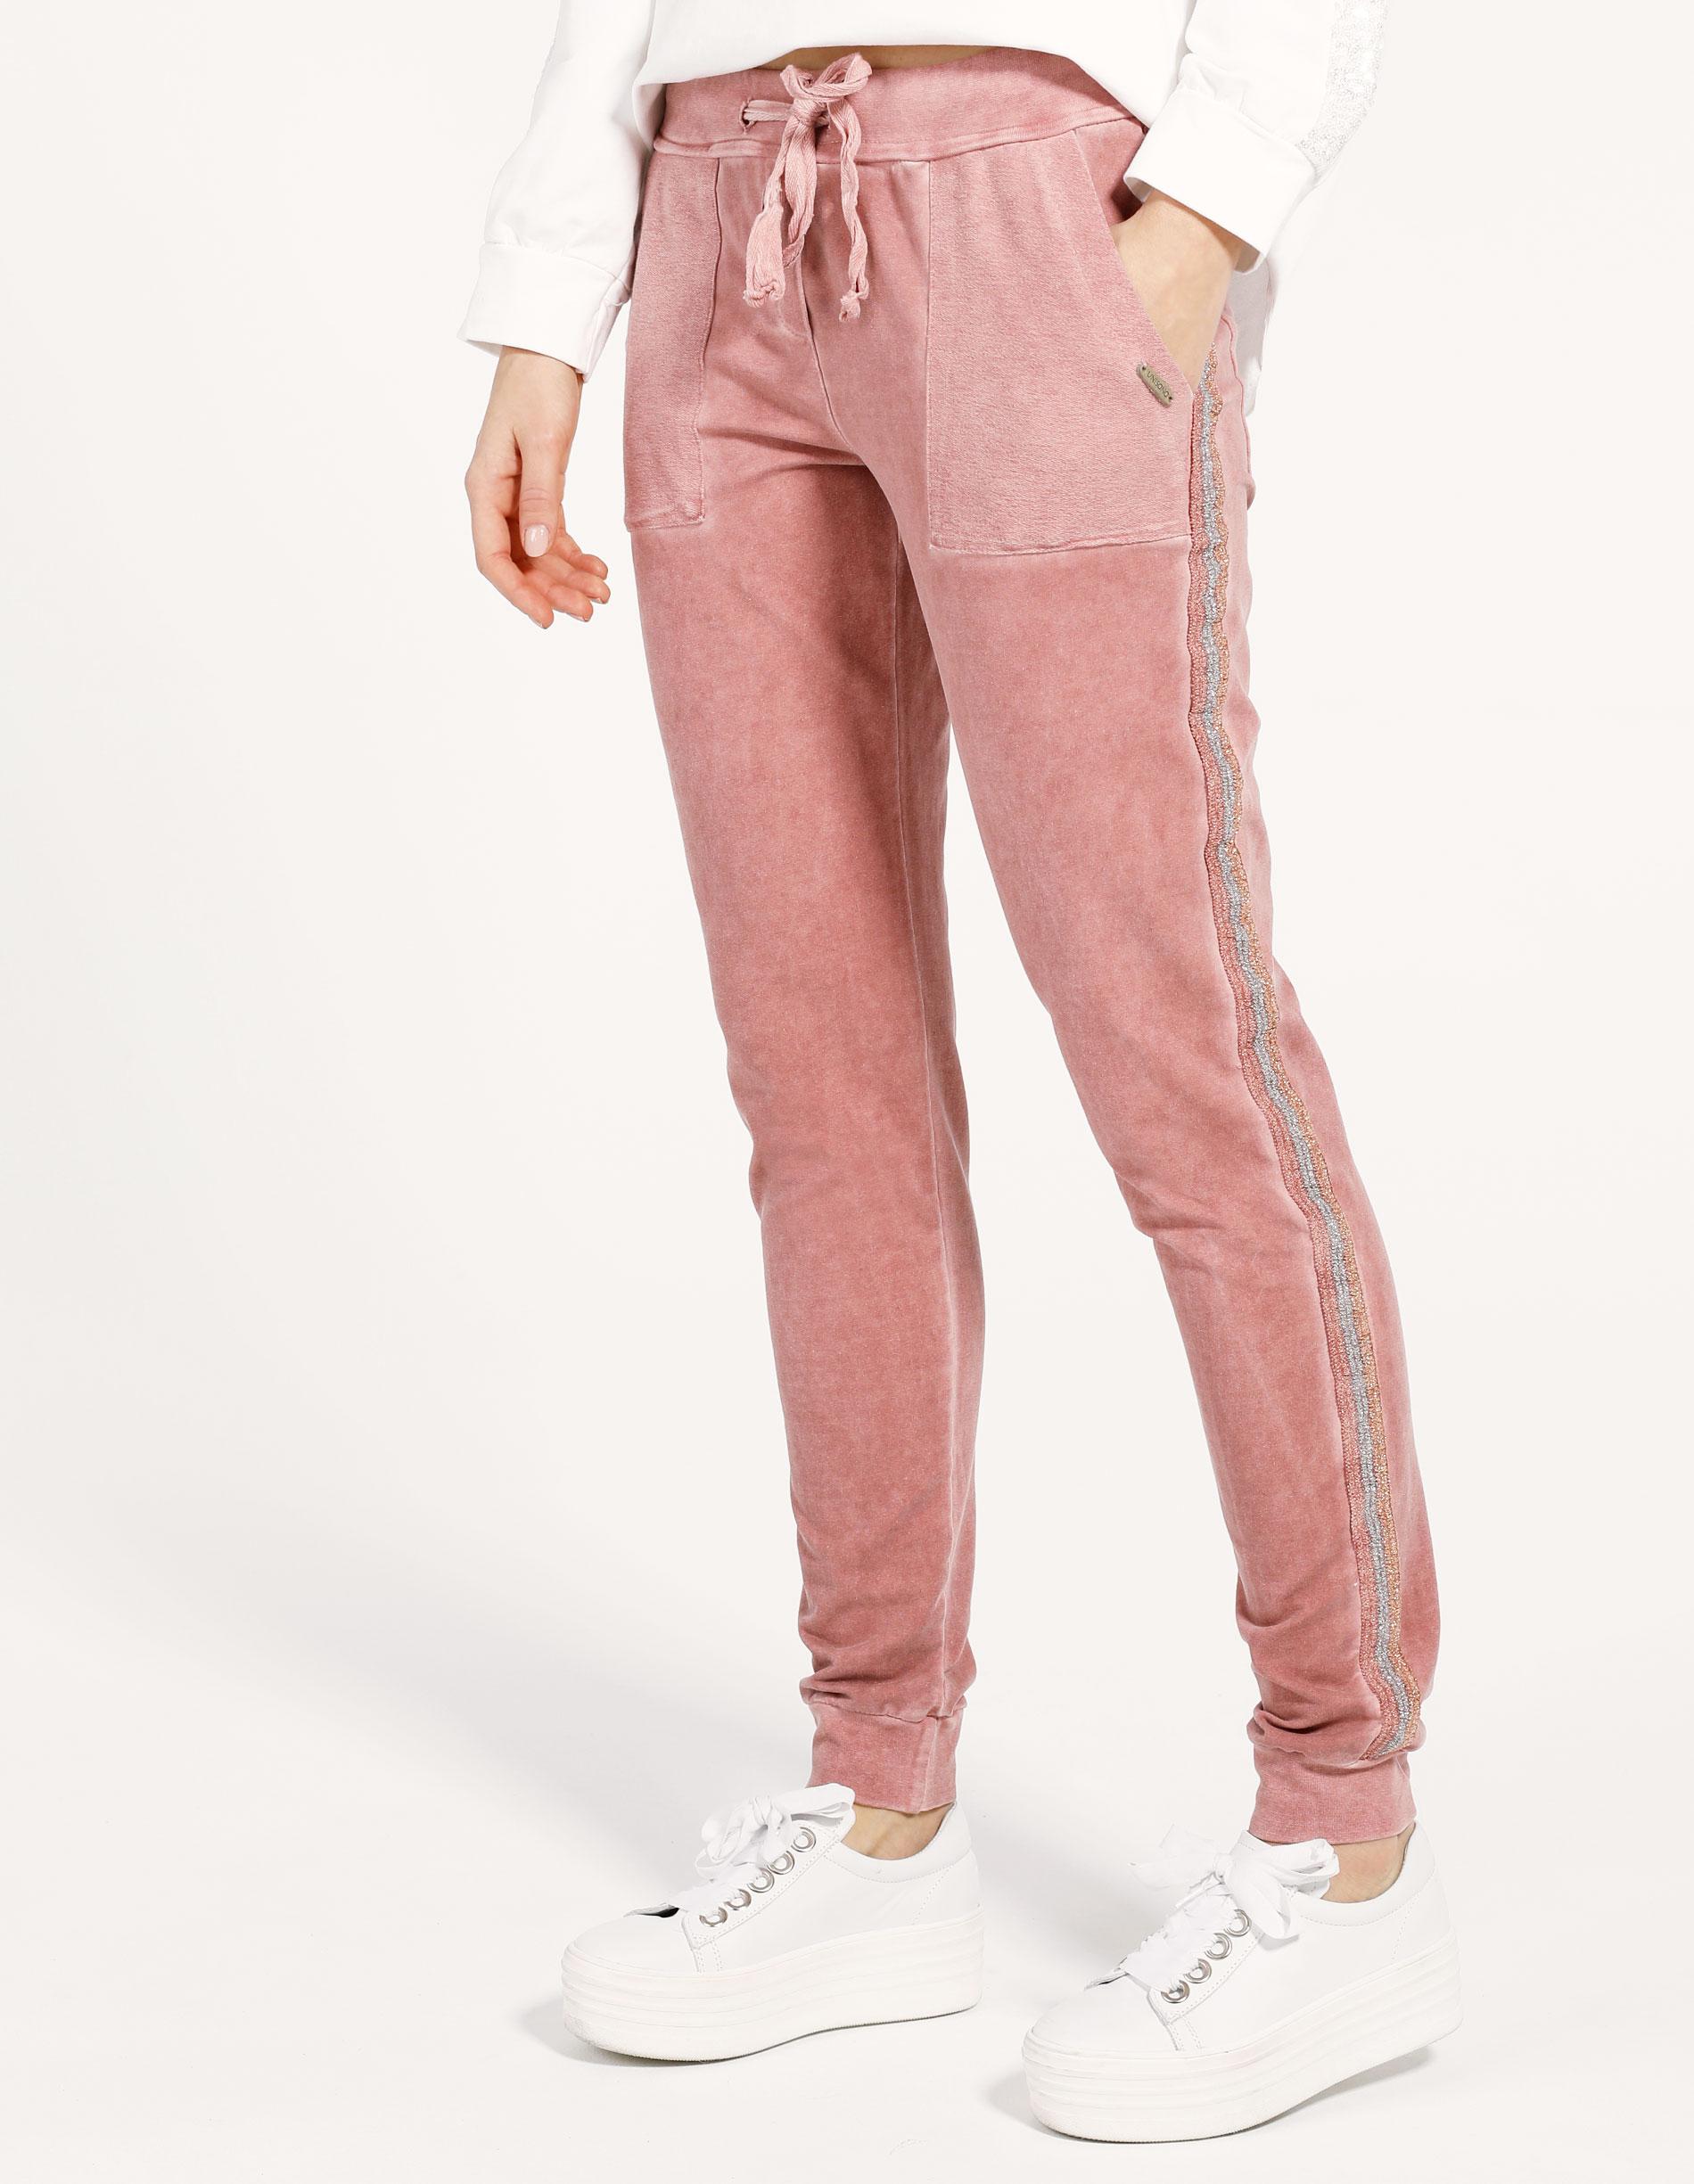 Spodnie - 158-2356 CHIL - Unisono